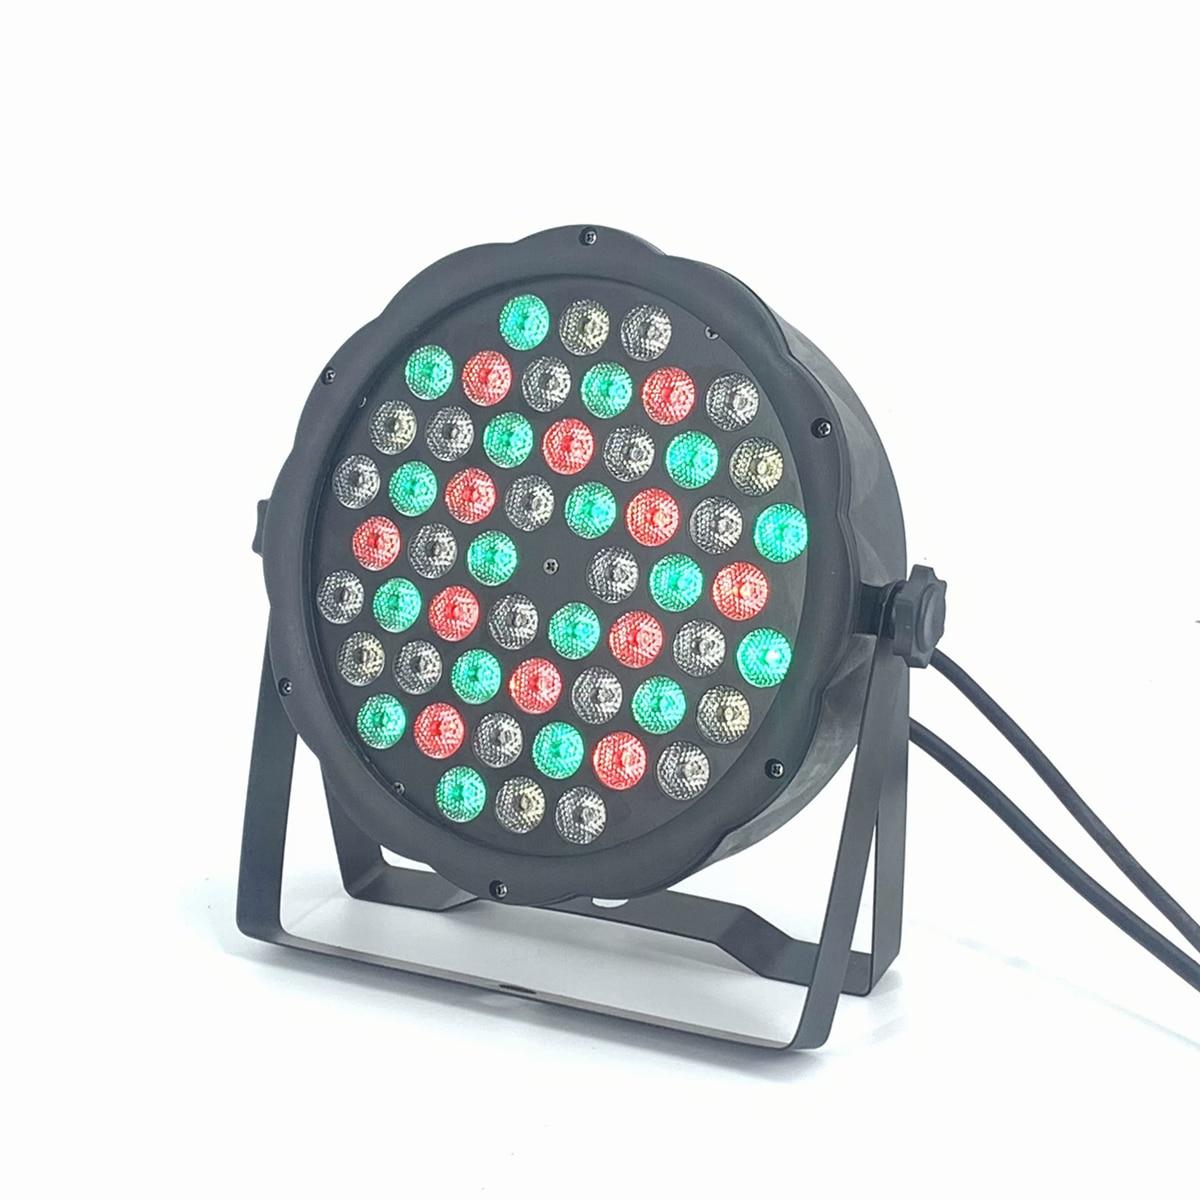 54x3W Led Par DJ Par LED RGBW White  Warm White UV Wash Disco Light DMX Controller Free Shipping RGBW